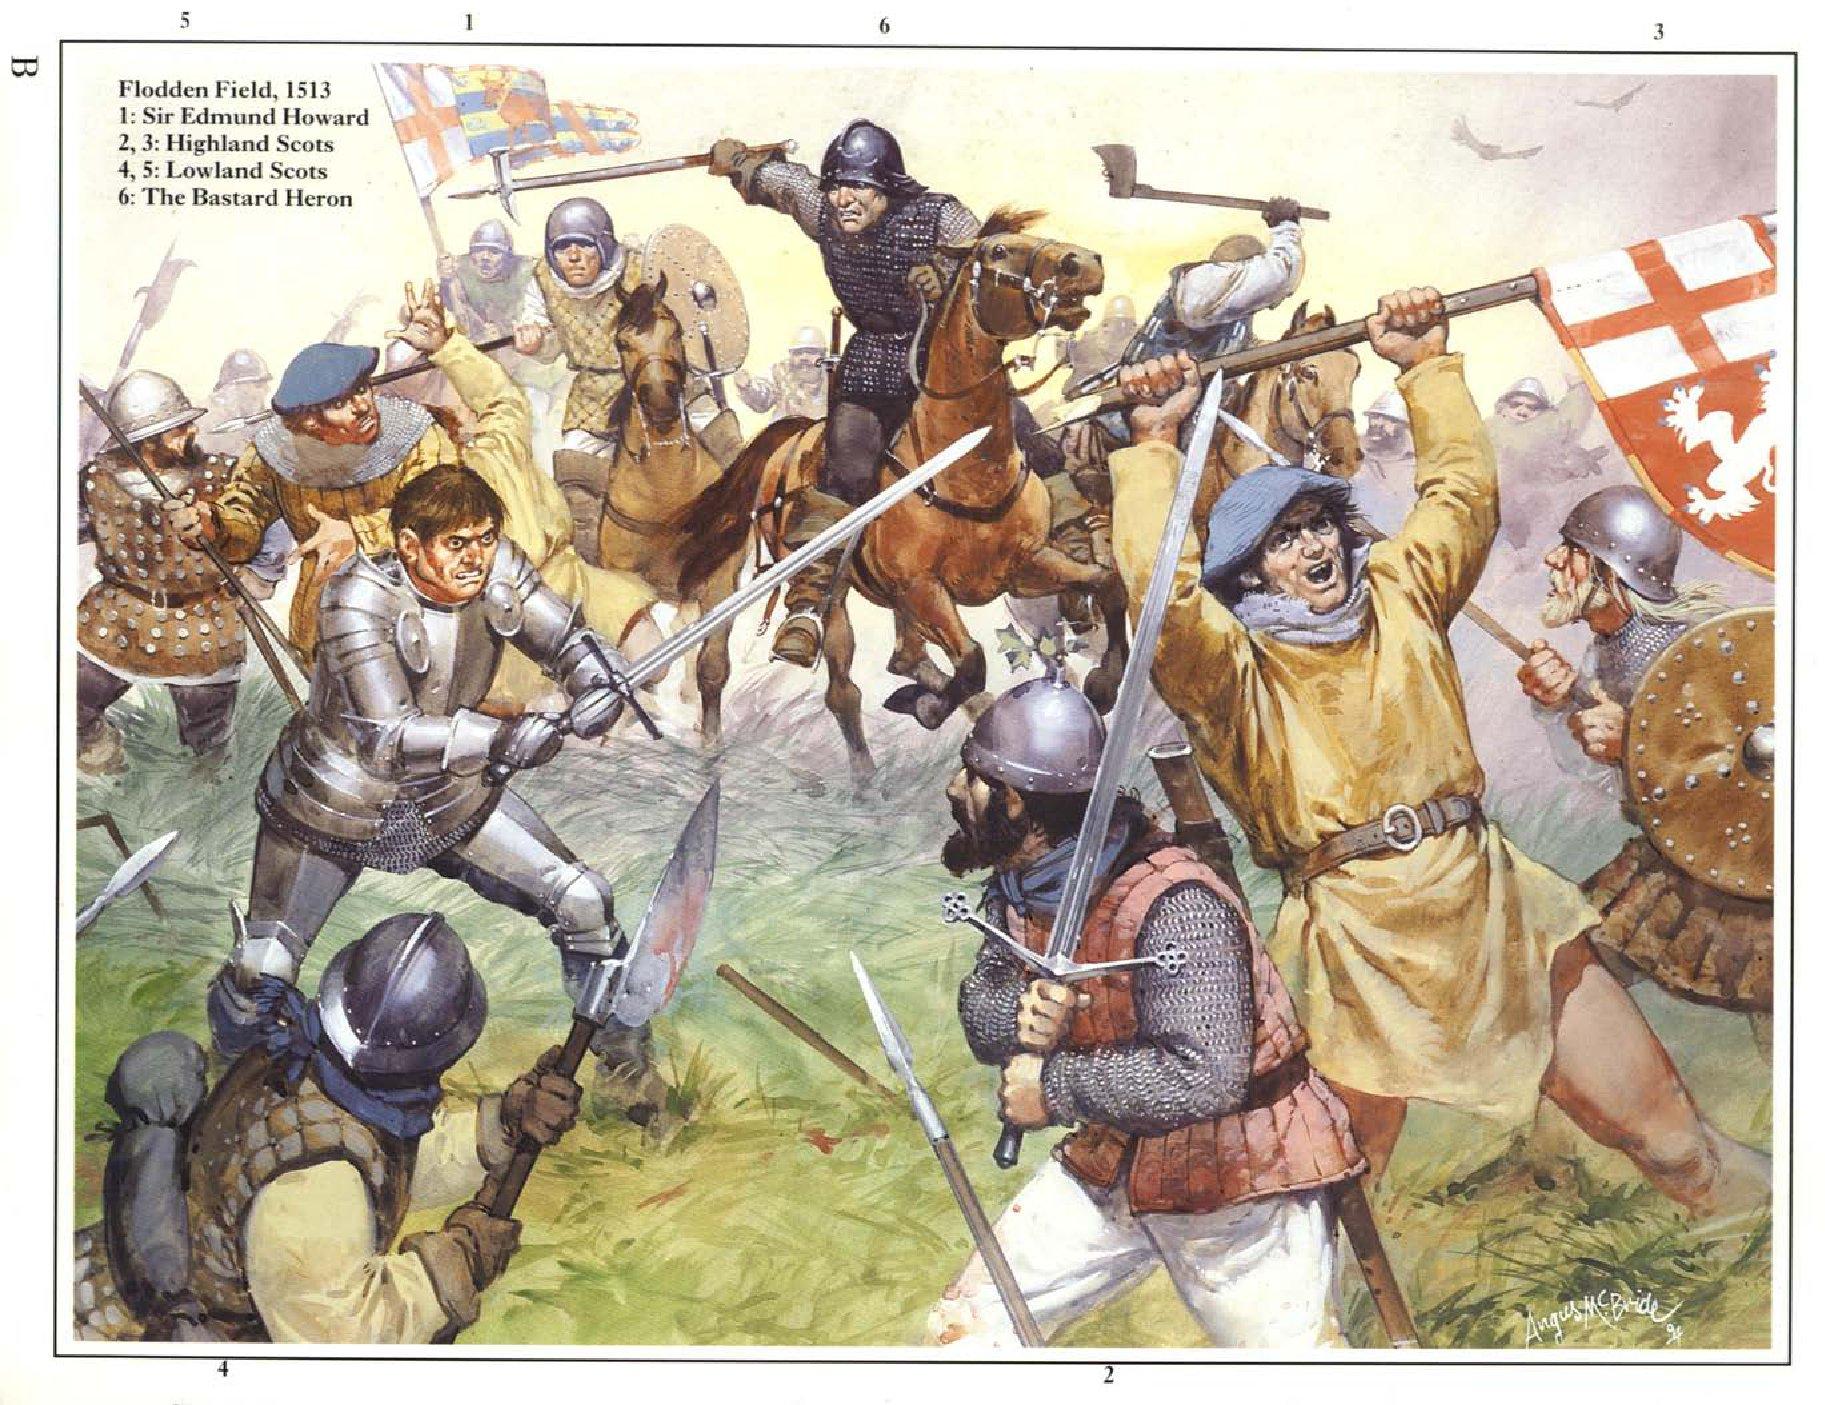 Flodden Field 1513 Twilight Of The English Longbow